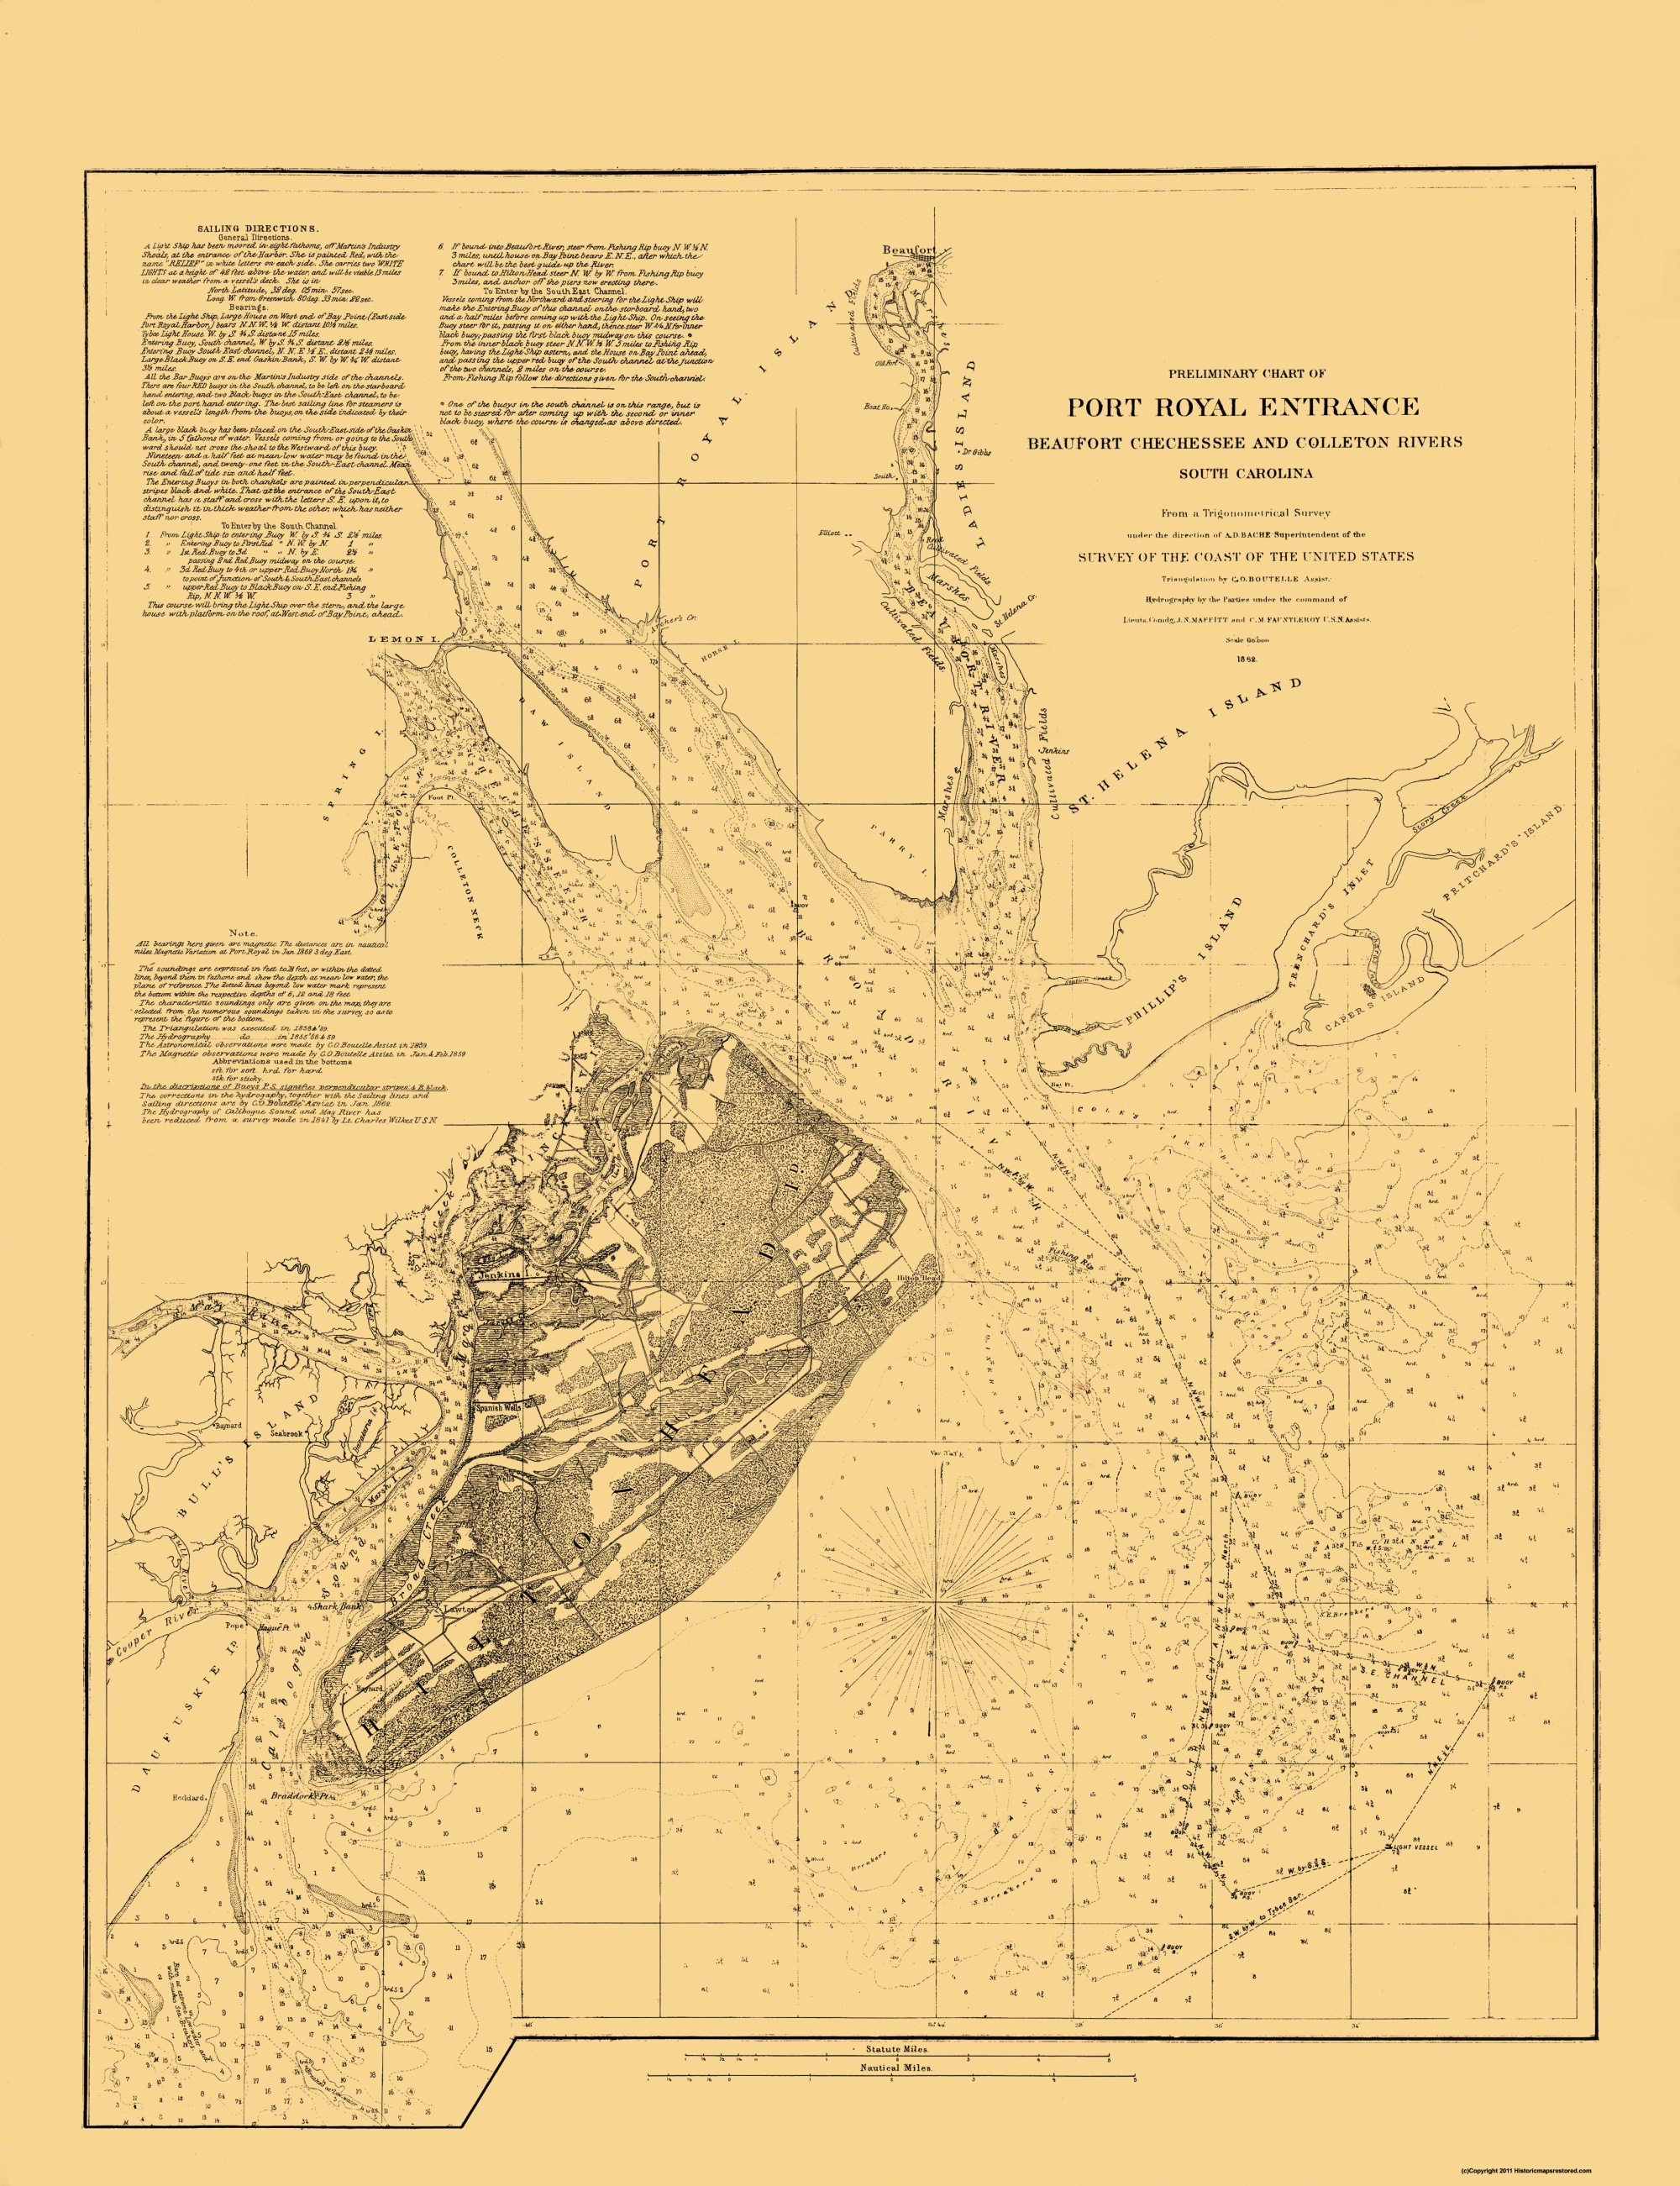 Hilton Head Island South Carolina Map.Old Map Hilton Head Island South Carolina Ship Channel